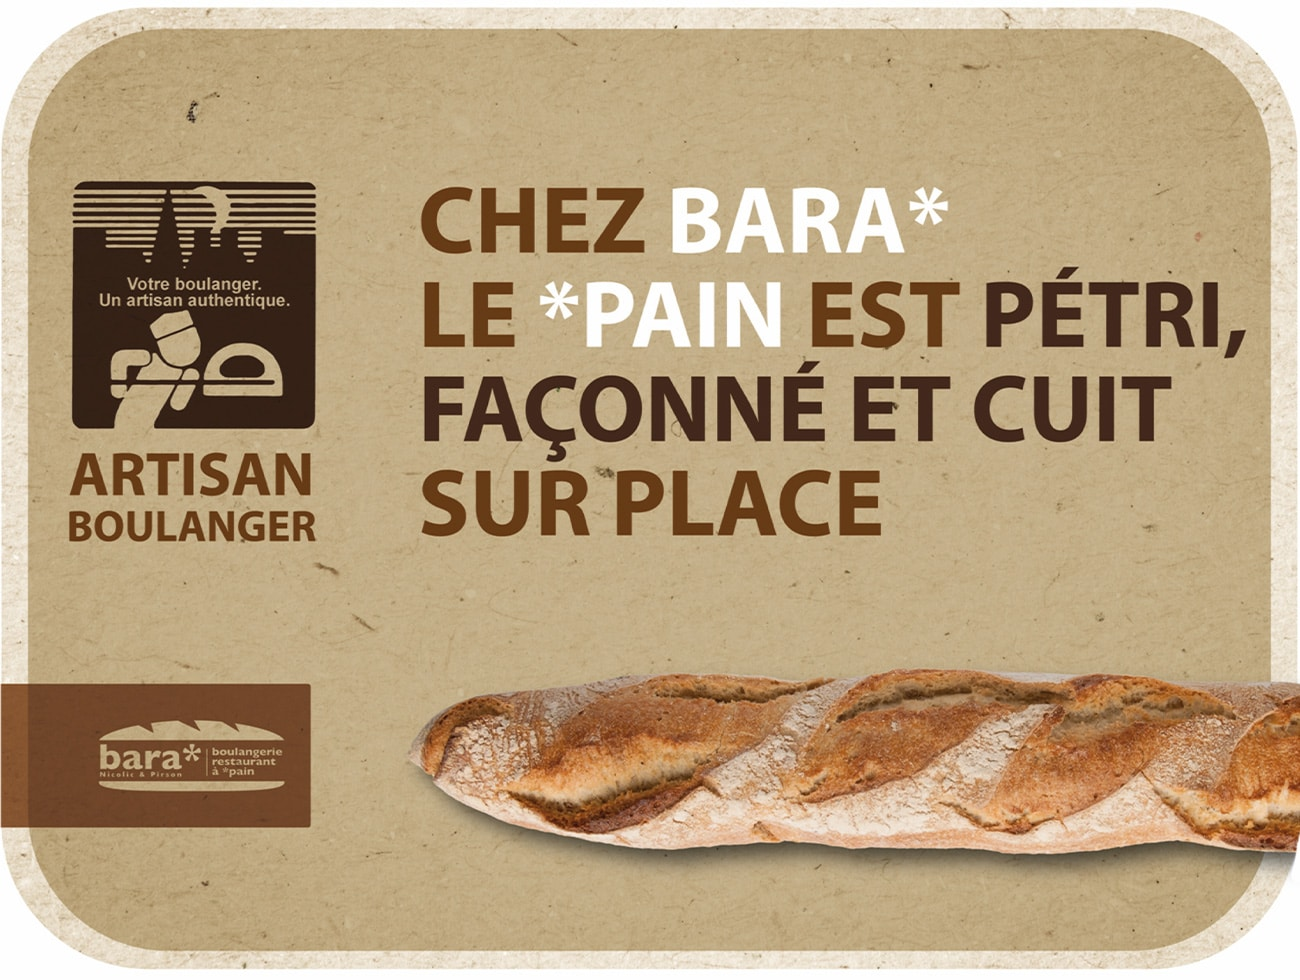 4-bara-boulangerie-positionnement-identite-visuelle-marketing-communication-bretagne-lorient